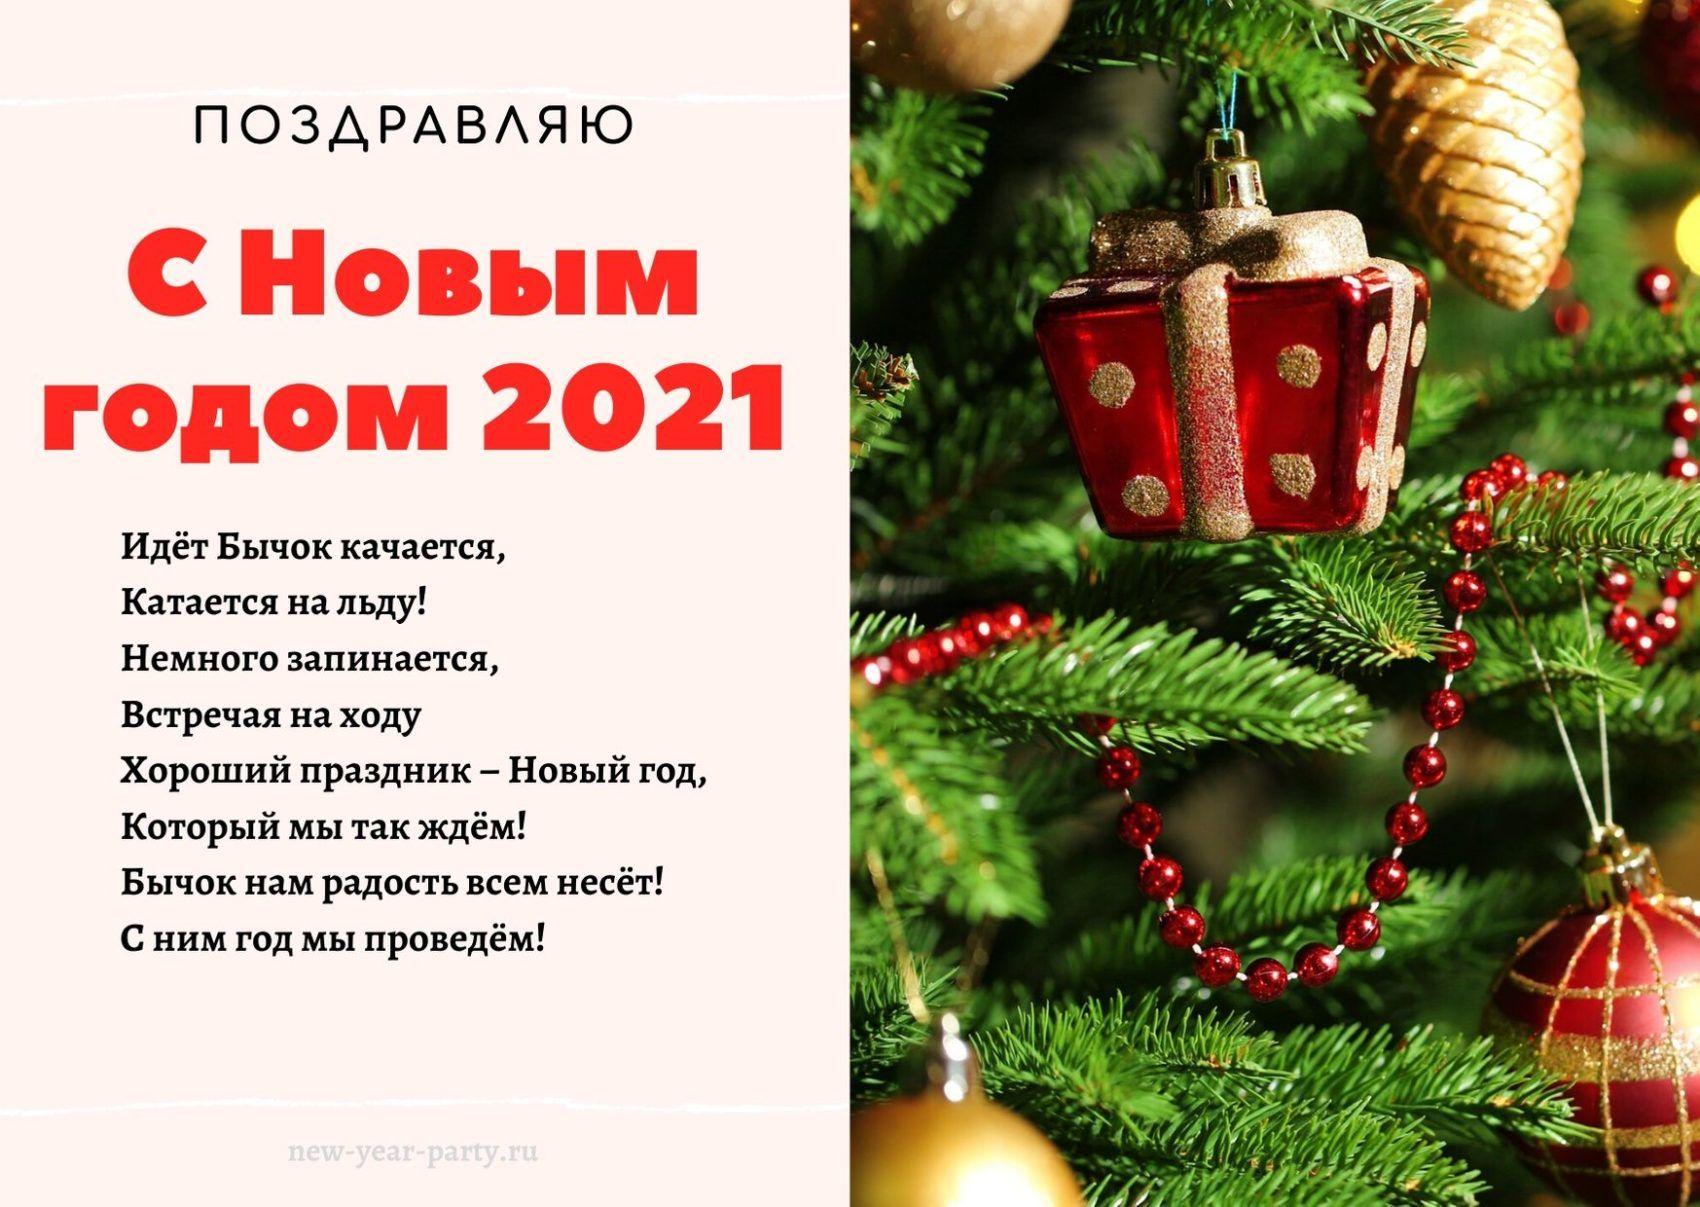 Pin By Dexter On Dlya Fona Christmas Ornaments Novelty Christmas Holiday